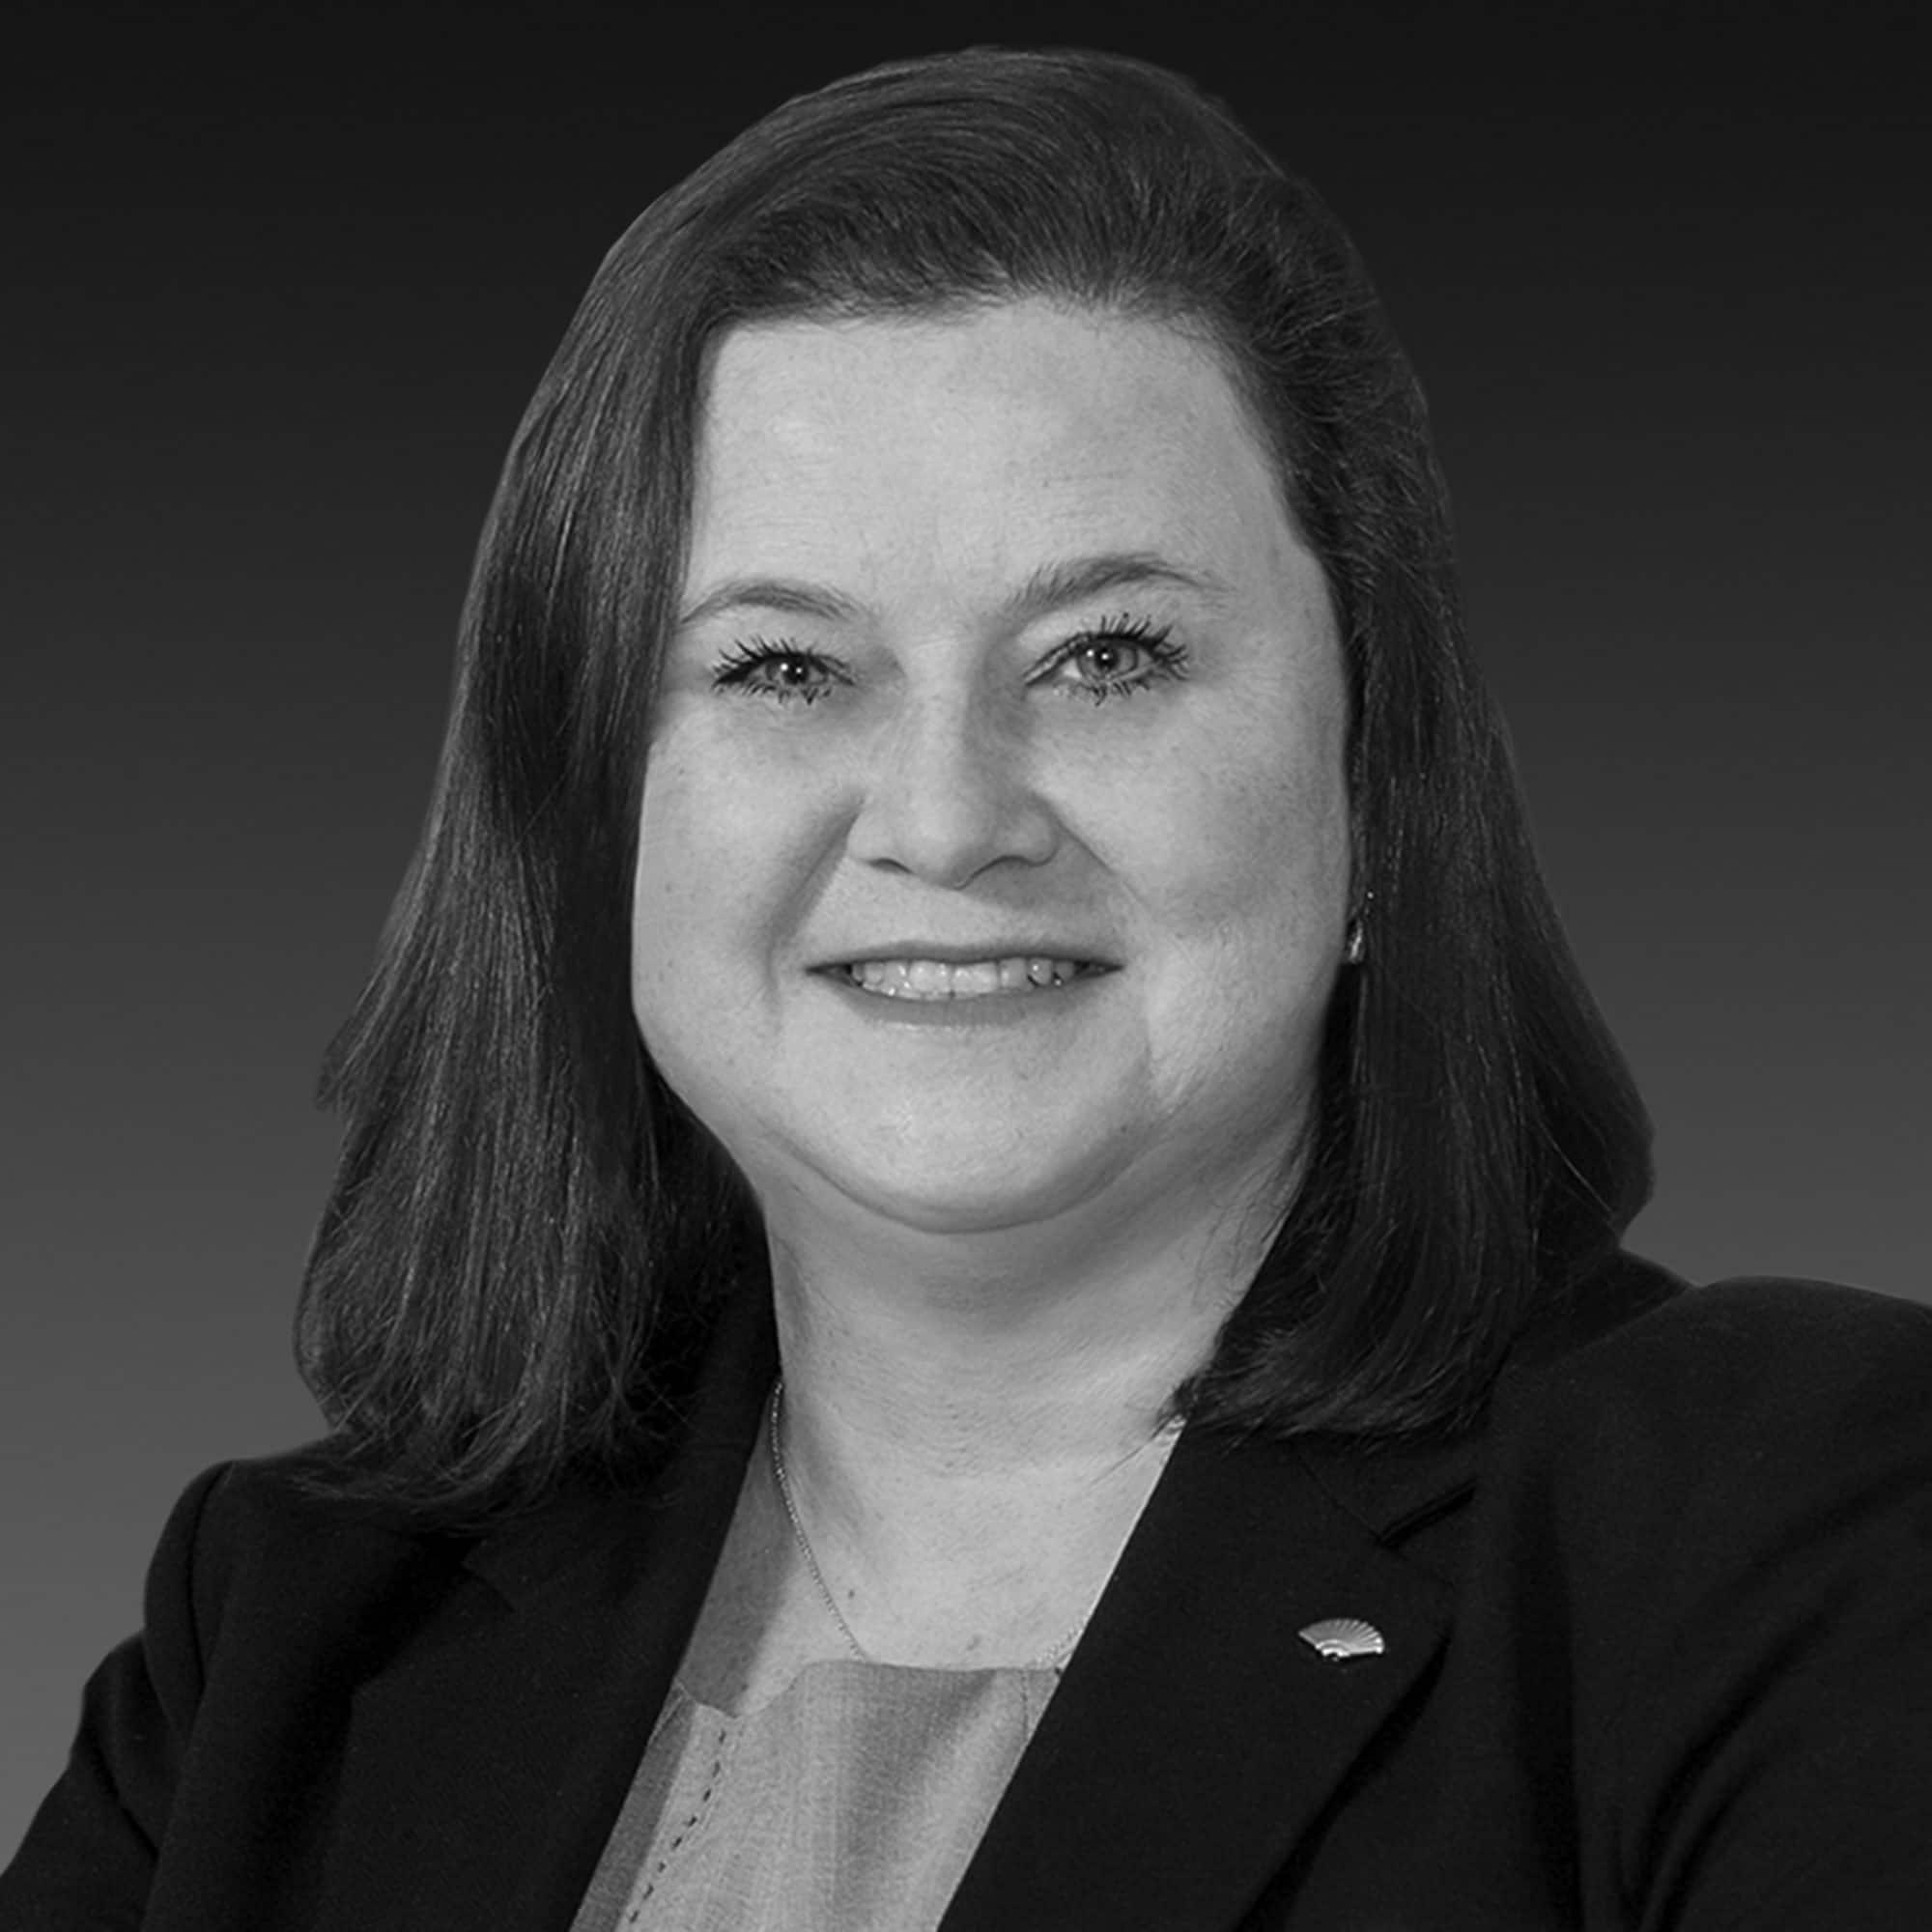 Katarina Dvorakova, Director of Marketing and Commerce